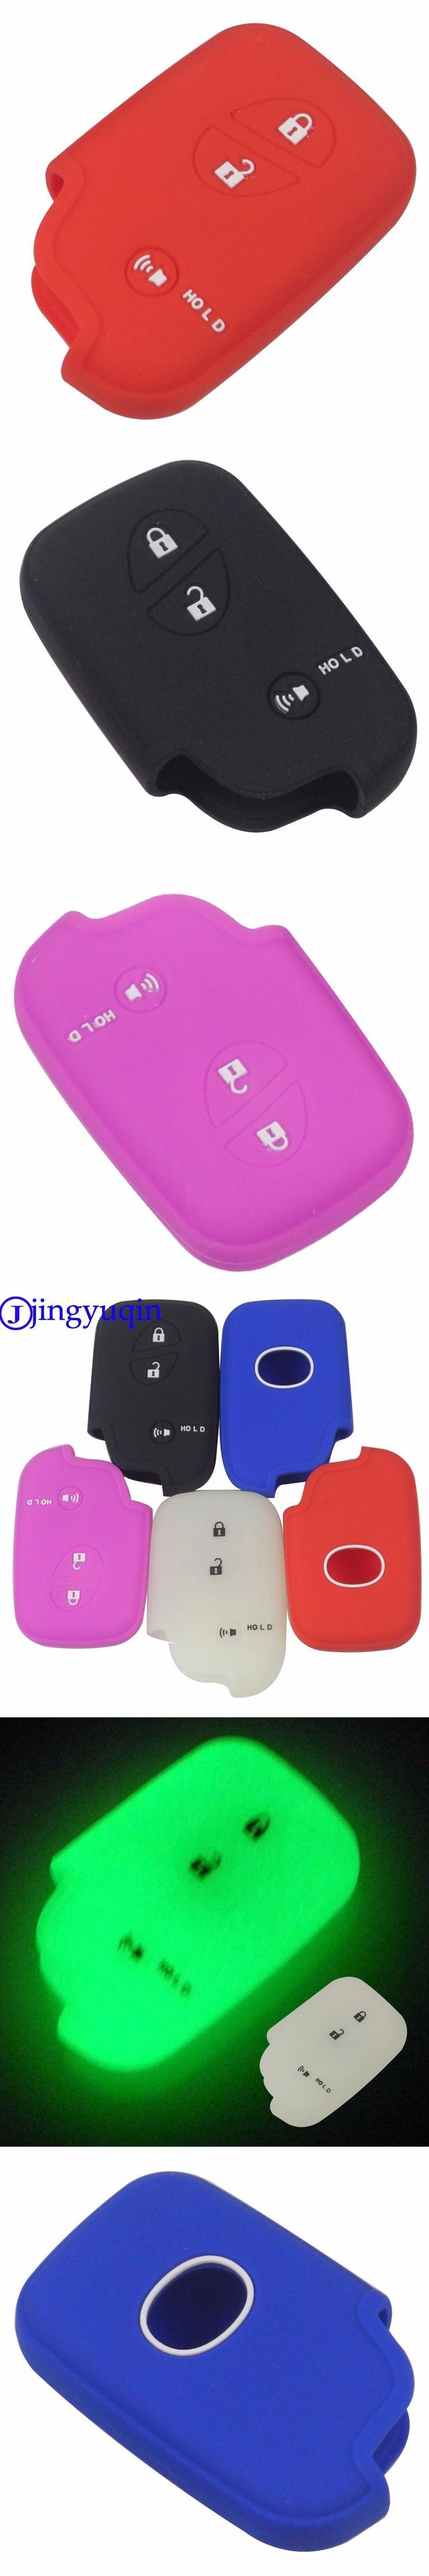 jingyuqin Remote 3 Buttons Silicone Rubber Key Fob Cover Case For Lexus CT200h ES 300h IS250 GX400 RX270 RX450h RX350 LX570